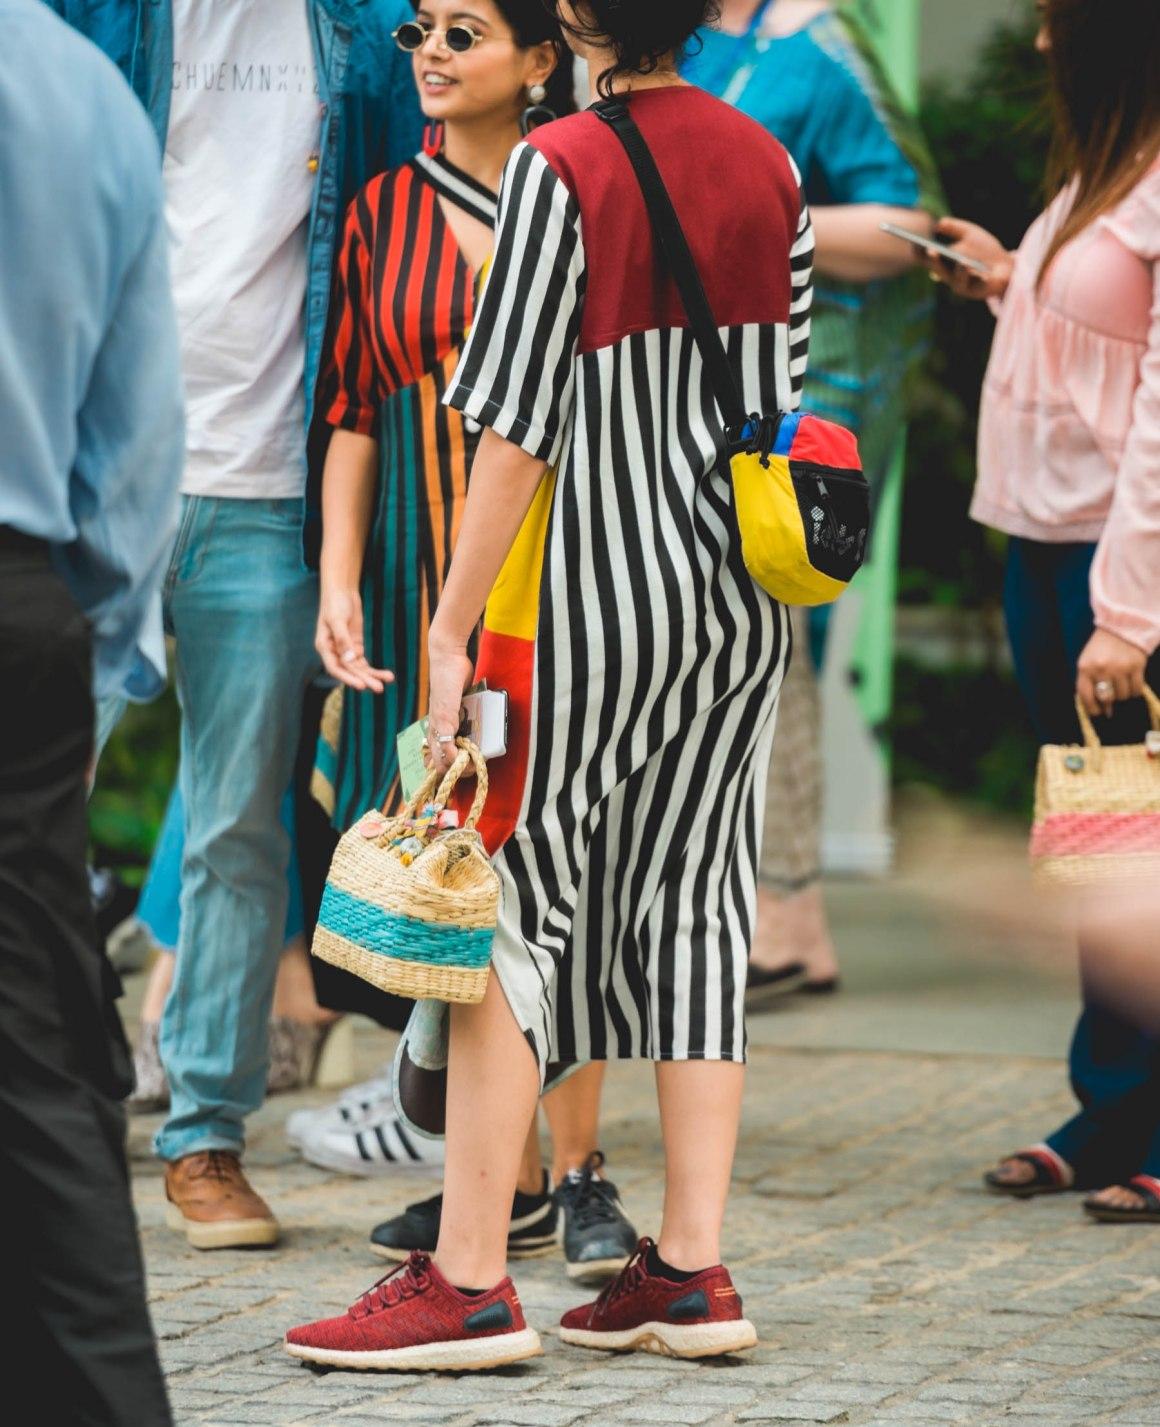 Naina Redhu, Naina.co, Naina, EyesForStreetStyle, Street Style, Eyes For Street Style, Fashion Week, Lotus Makeup India Fashion Week, LMIFWSS19, Spring Summer, 2019, New Delhi Fashion Week, India Fashion Week, LMIFW, Street Fashion, Style, Professional Photographer, Professional Blogger, Photo Blogger, Lifestyle Photographer, Lifestyle Blogger, Fashion Photographer, Fashion Blogger, Style Blogger, Speaker, Podcaster, Artist